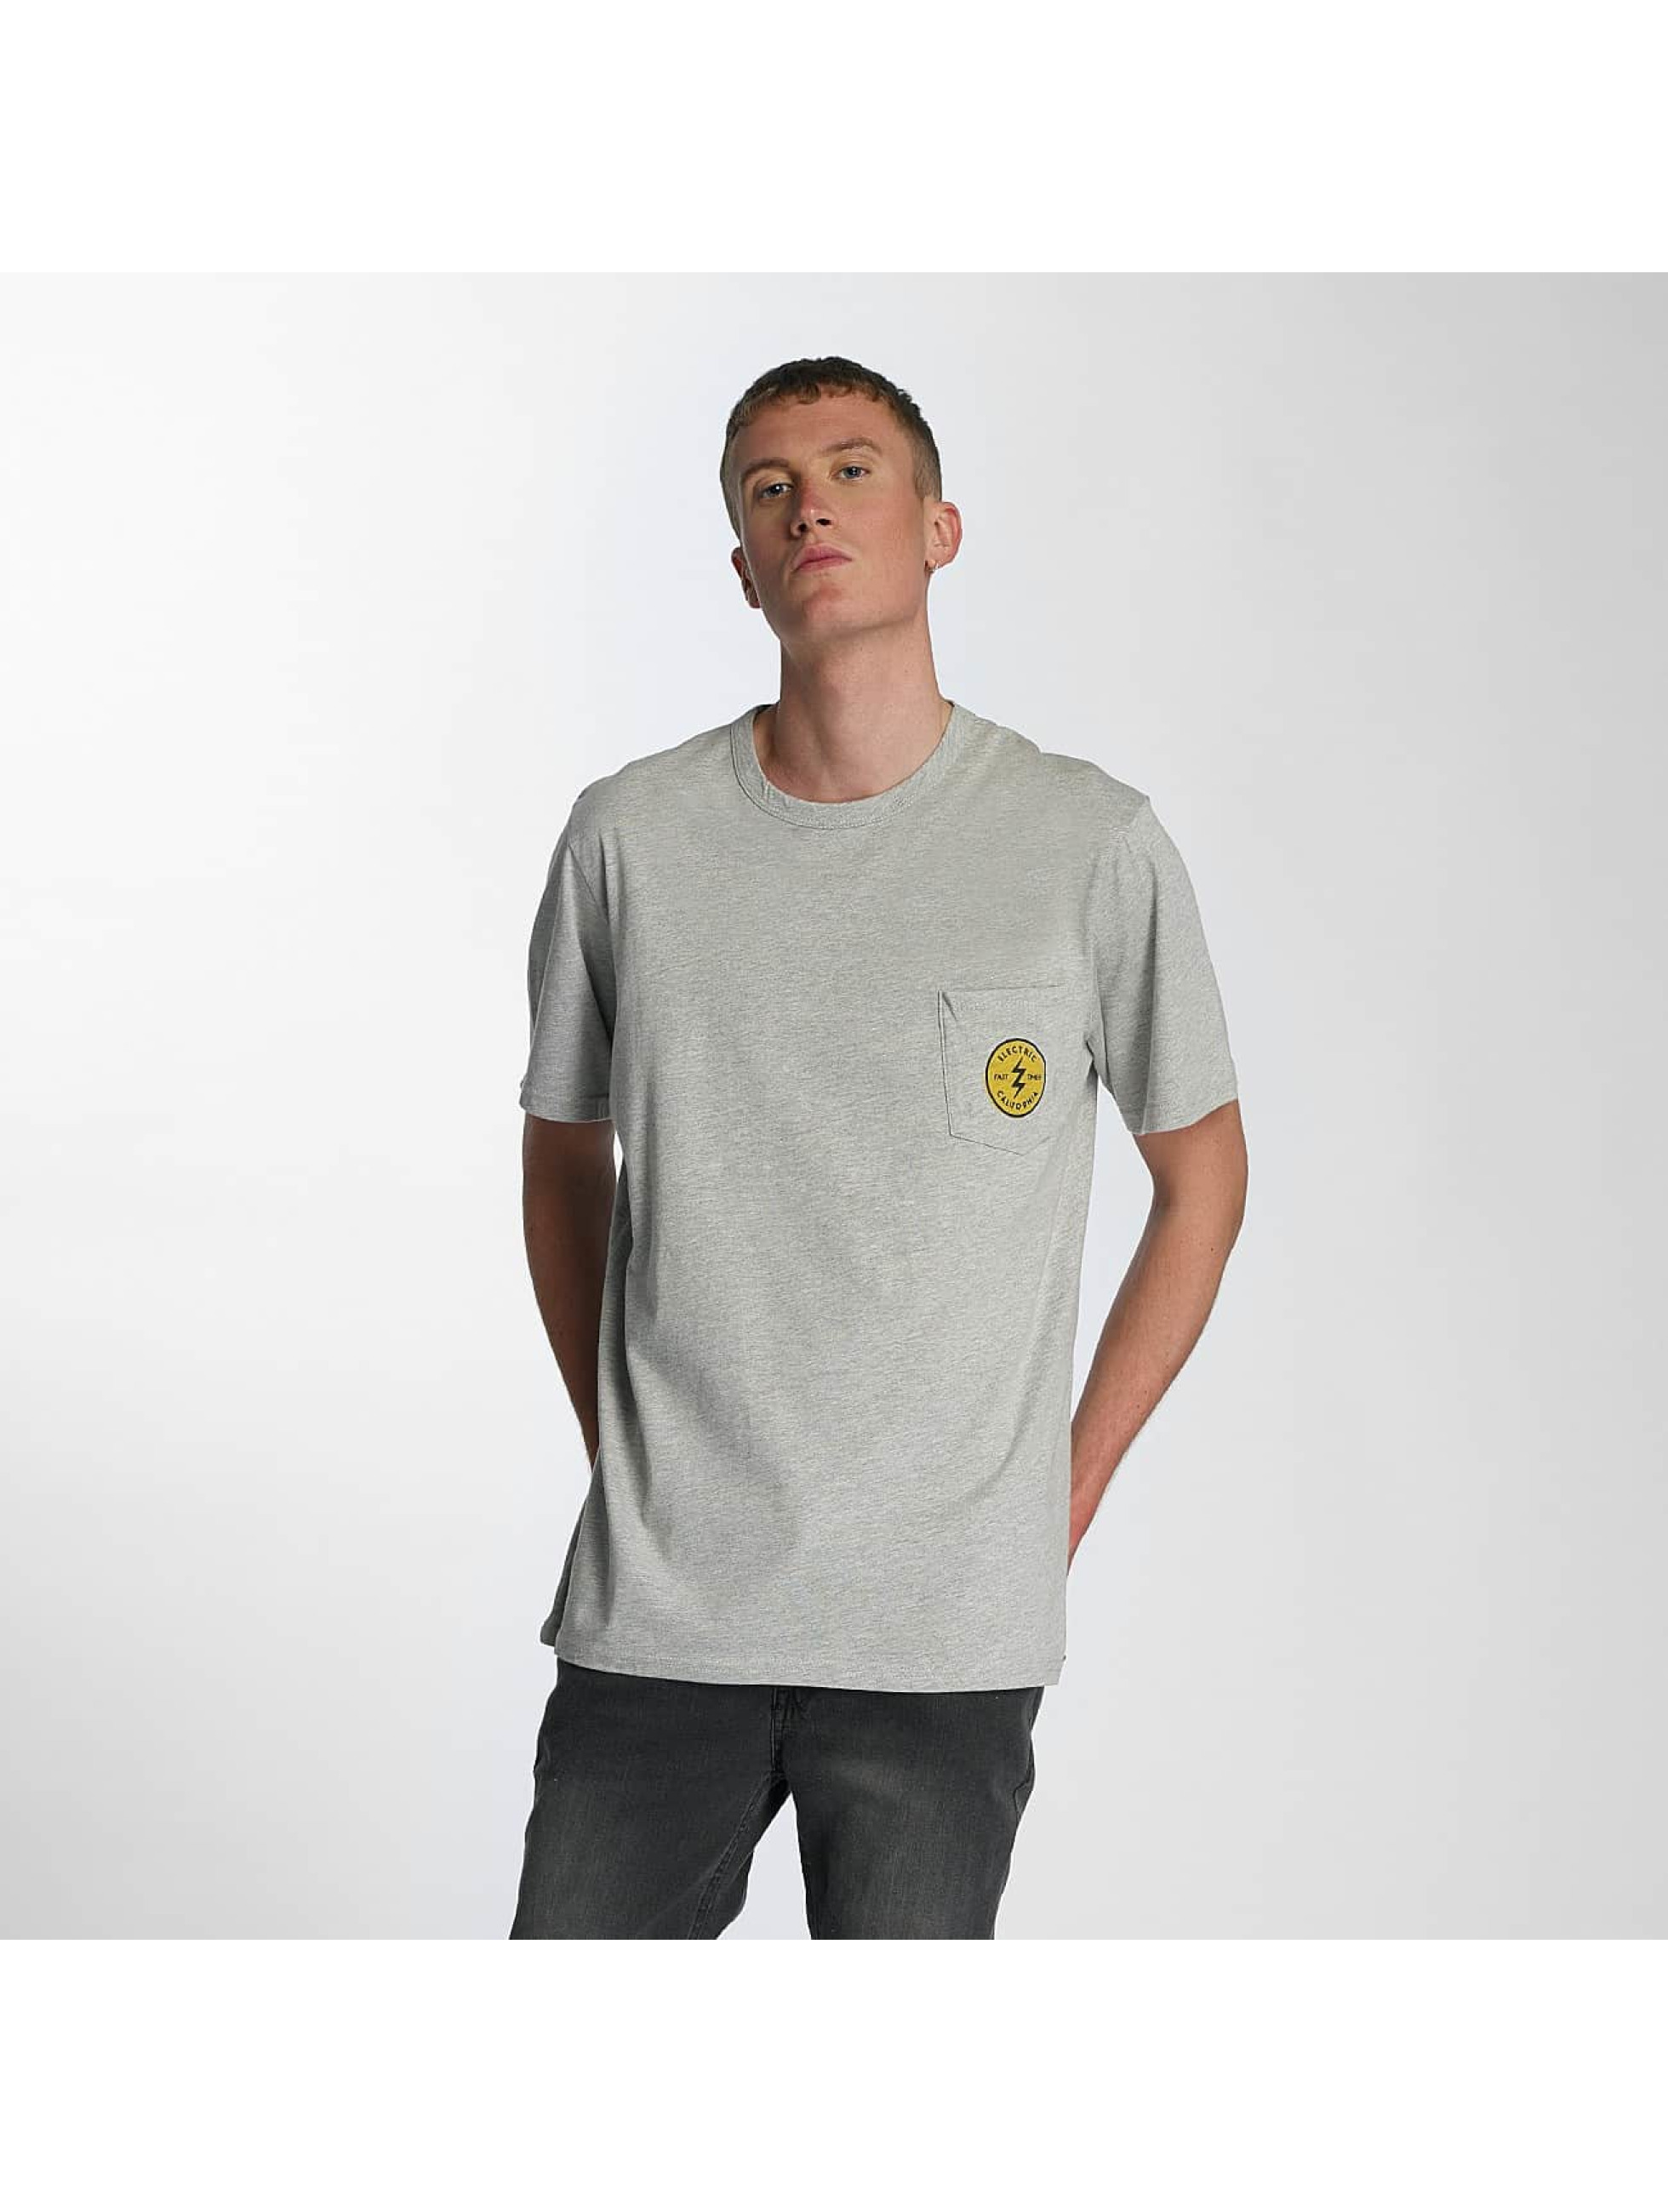 Electric T-Shirt Fast Time Pocket grau